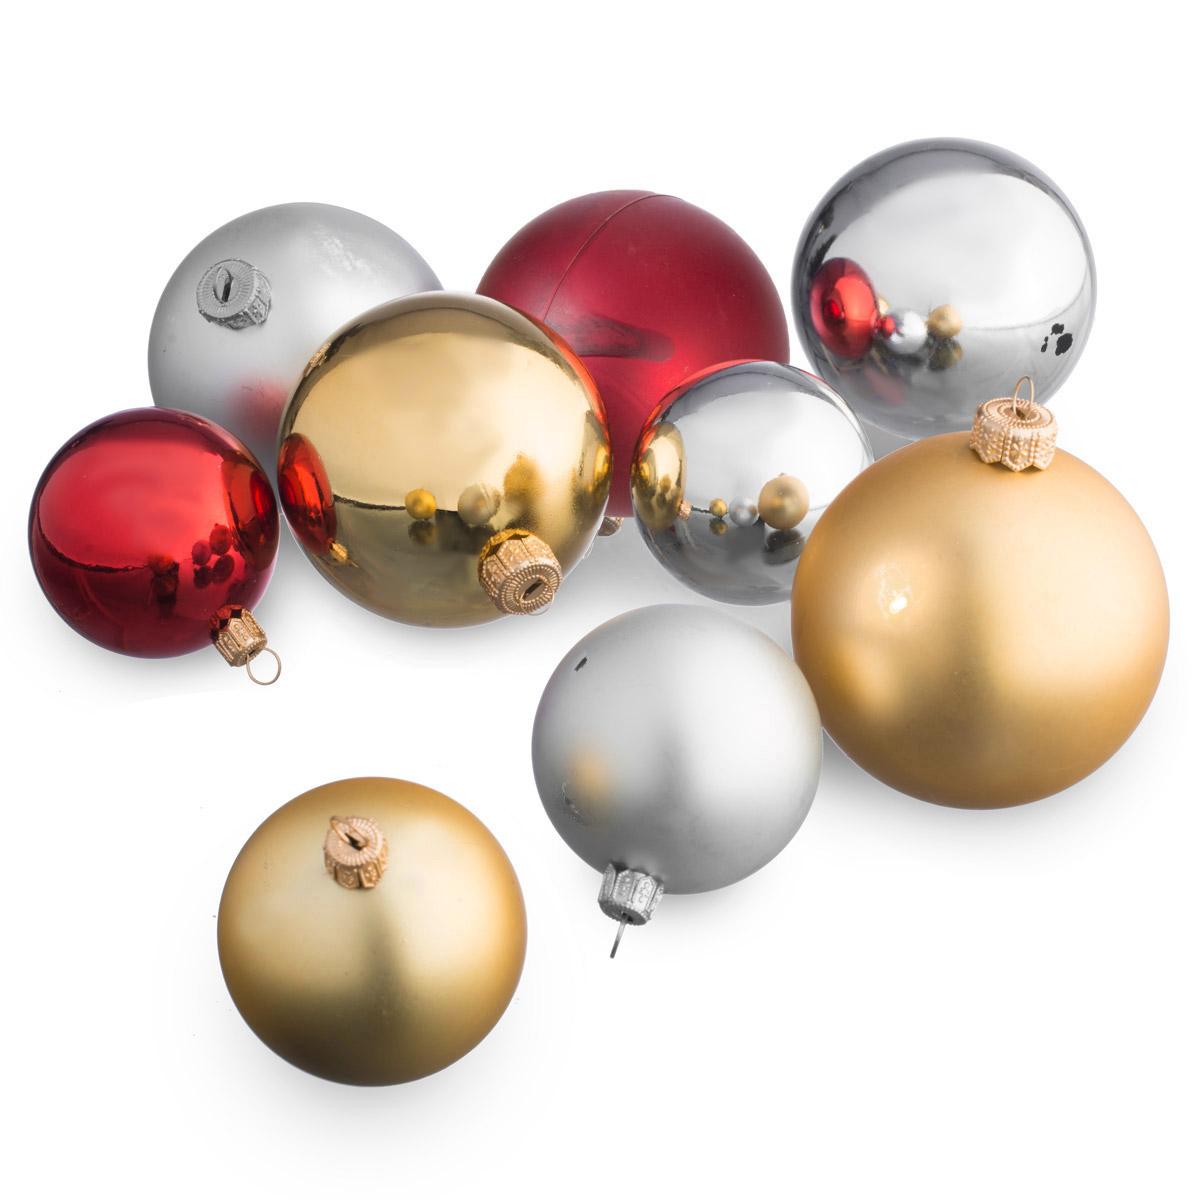 weihnachtskugel christbaumkugel christbaumschmuck haken aufh nger baumkugel ebay. Black Bedroom Furniture Sets. Home Design Ideas